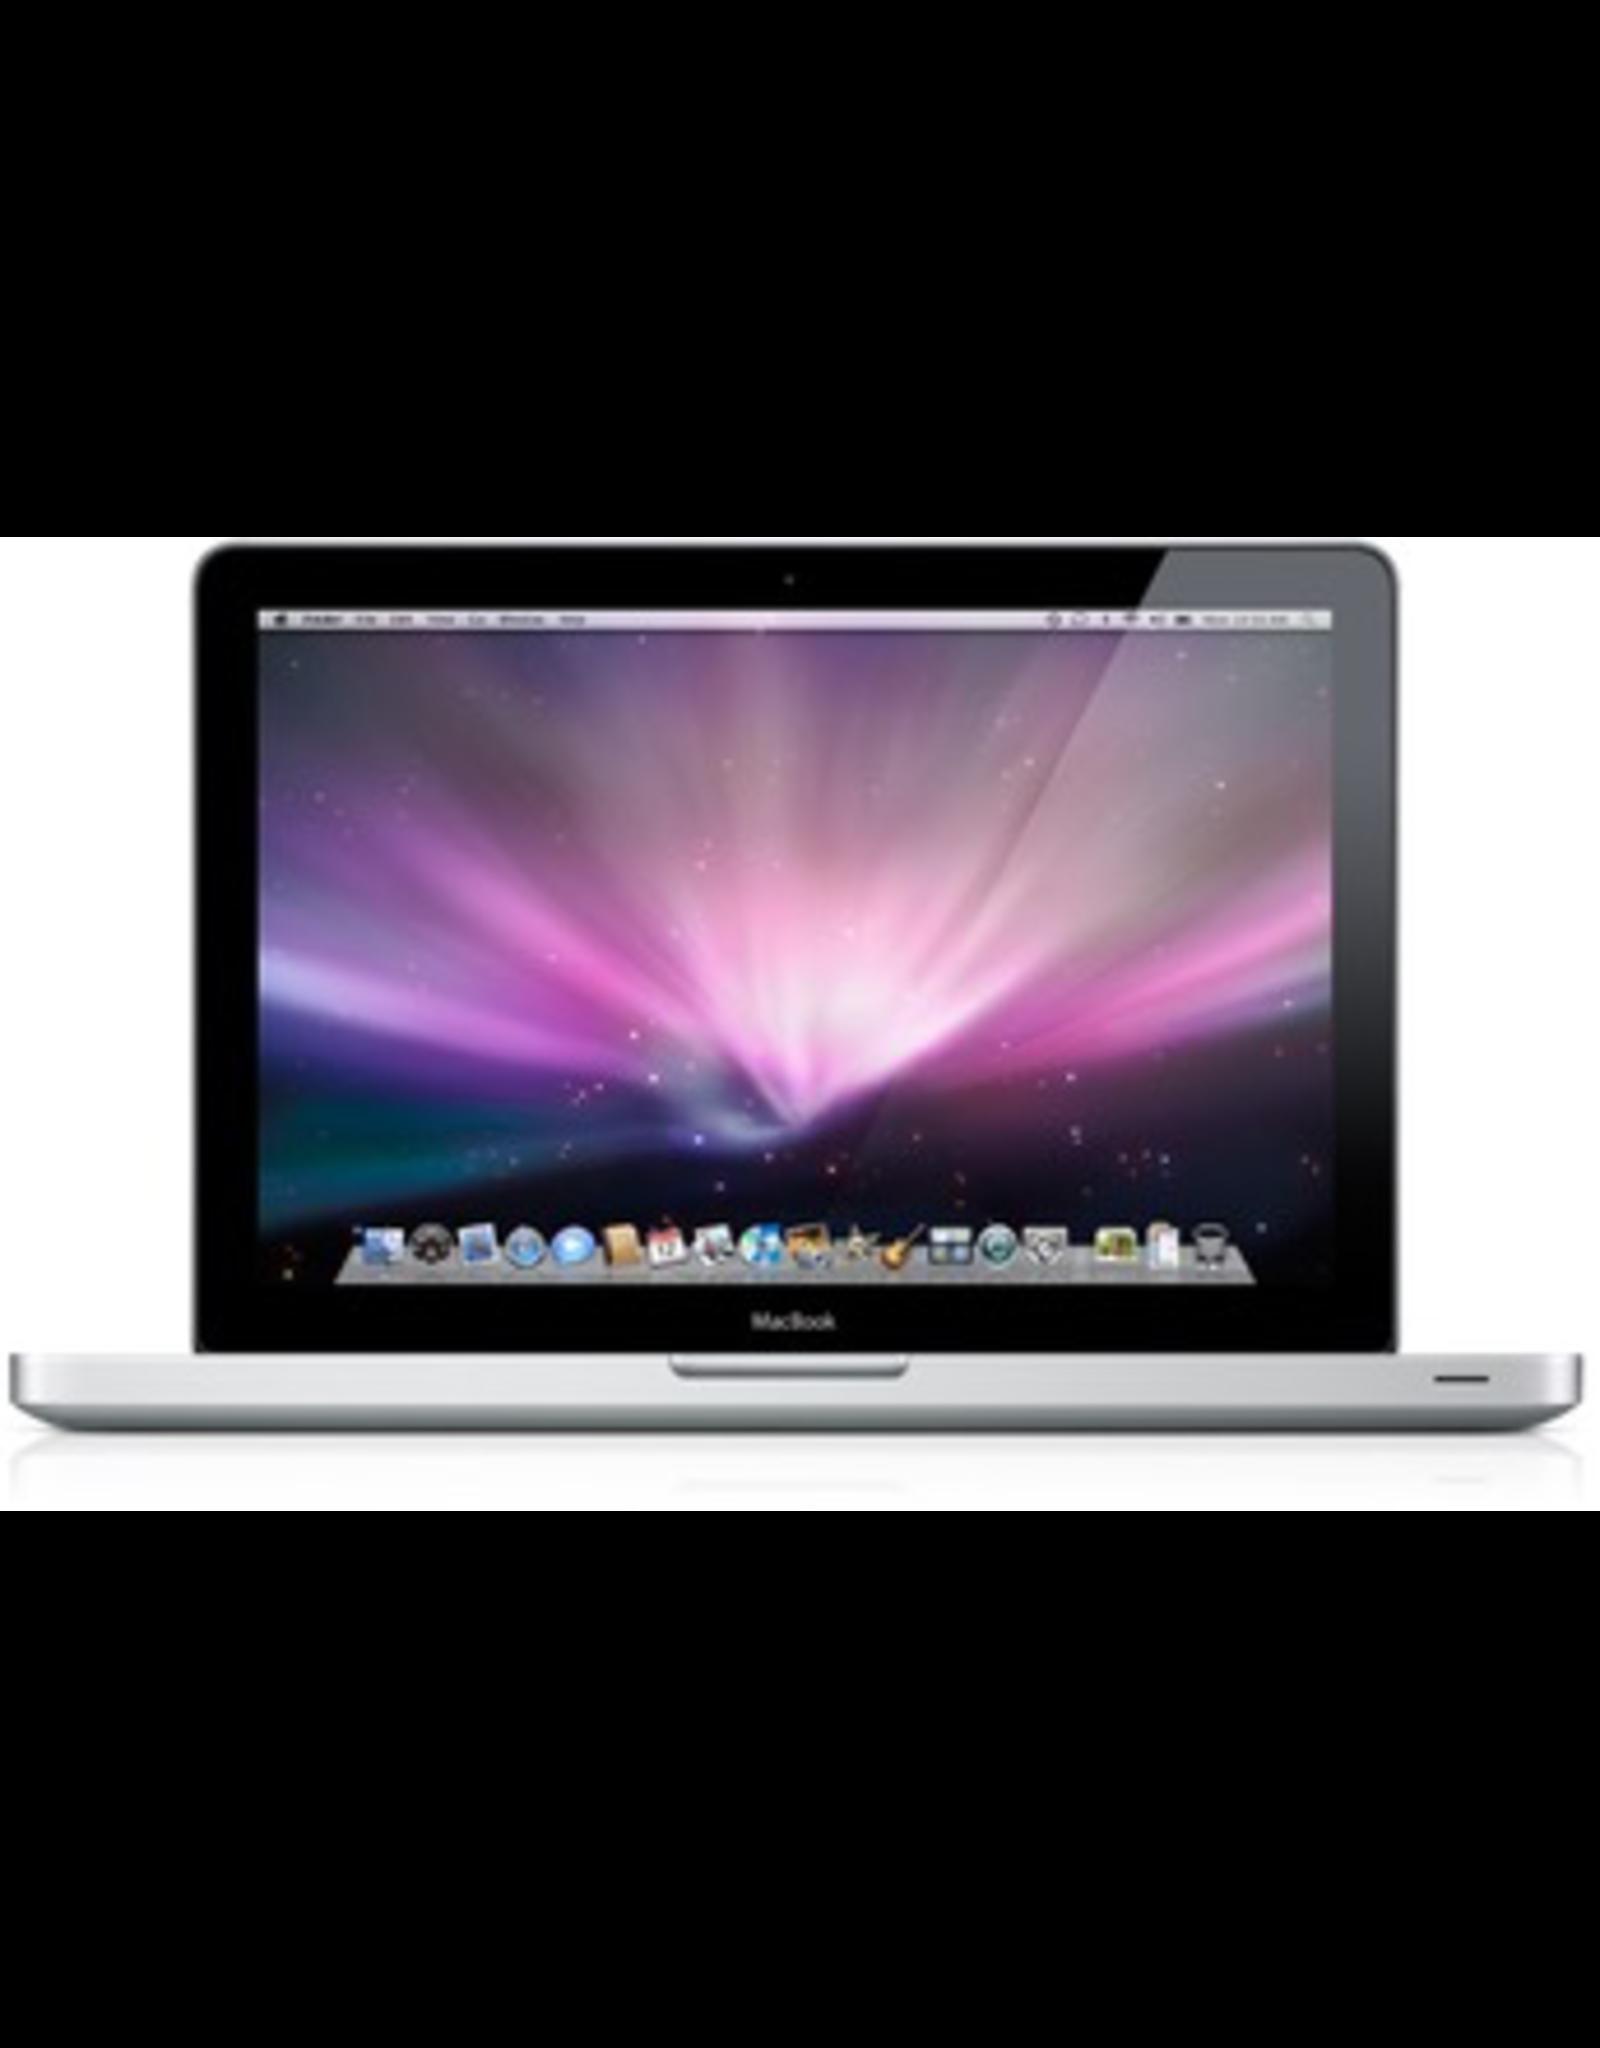 Apple MacBook Pro (13-inch, Mid 2010) - 2.4 GHz Intel Core 2 Duo / 4GB RAM / 120GB SSD - 30 Day Exchange